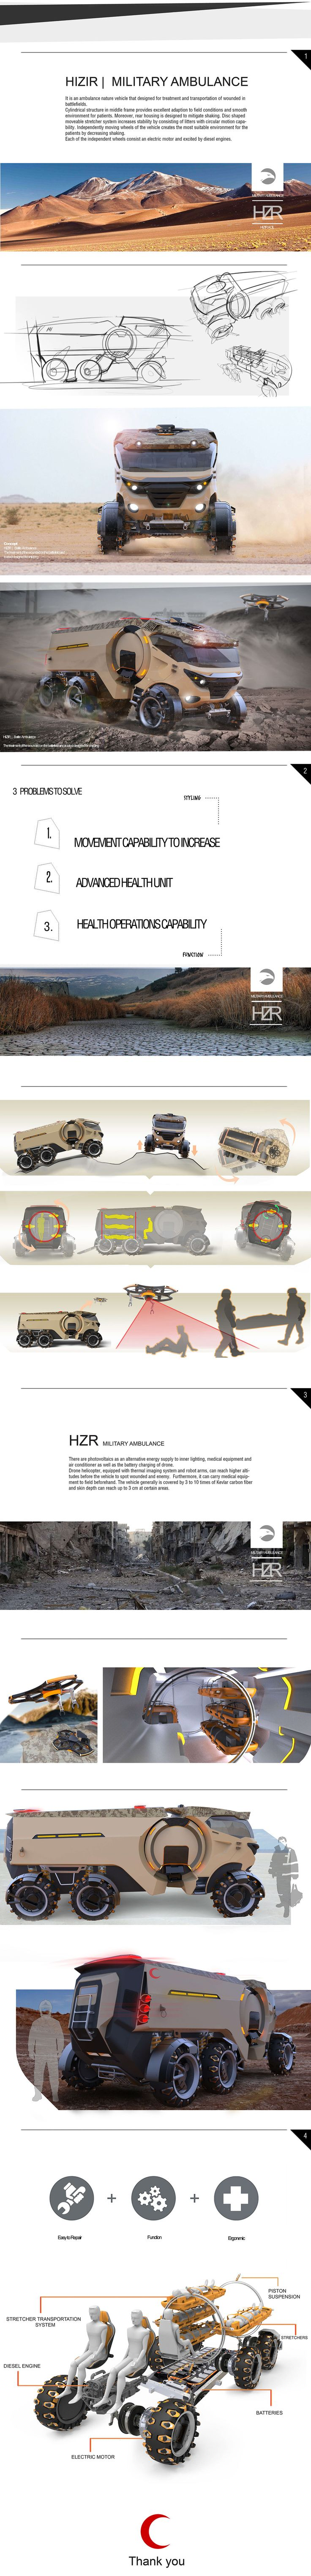 Military Ambulance Design - HZR  Designers: -Tamer YÜKSEK -Kürşat Kemal KUL -Mehmet MEHMETALİOĞLU